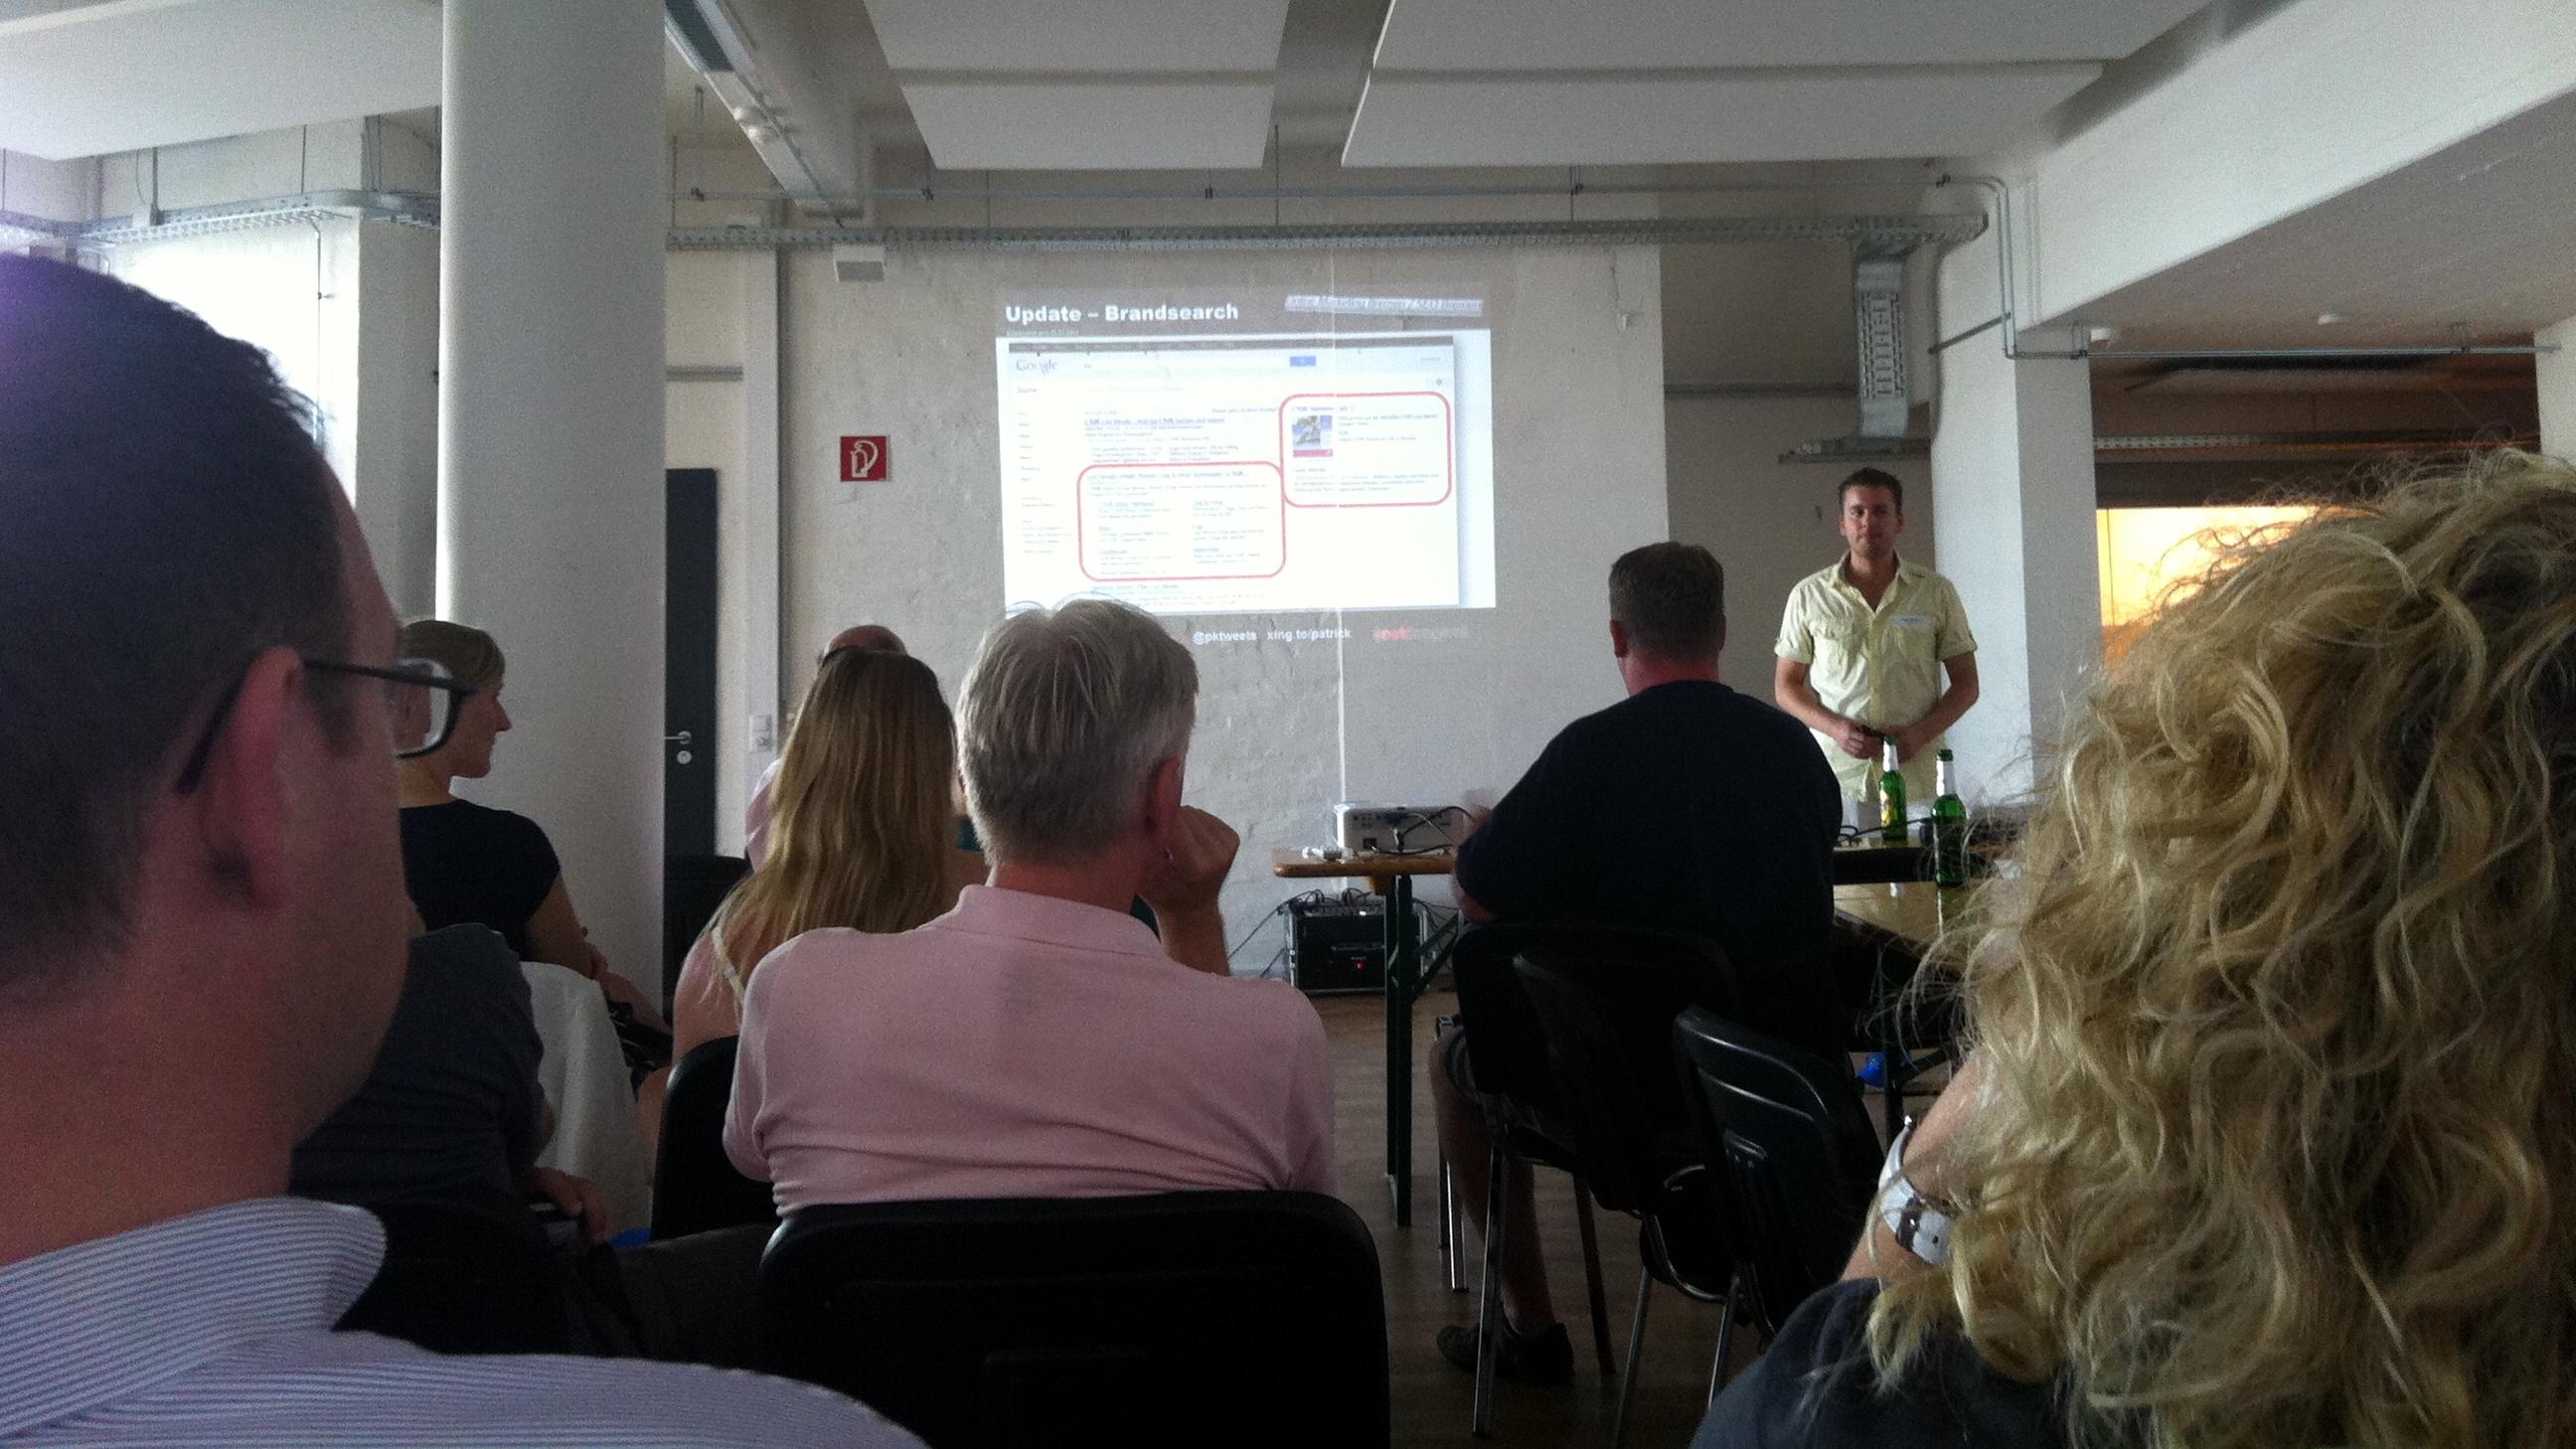 OMS Bremen- Patrick Klingberg zu SEO und Google+